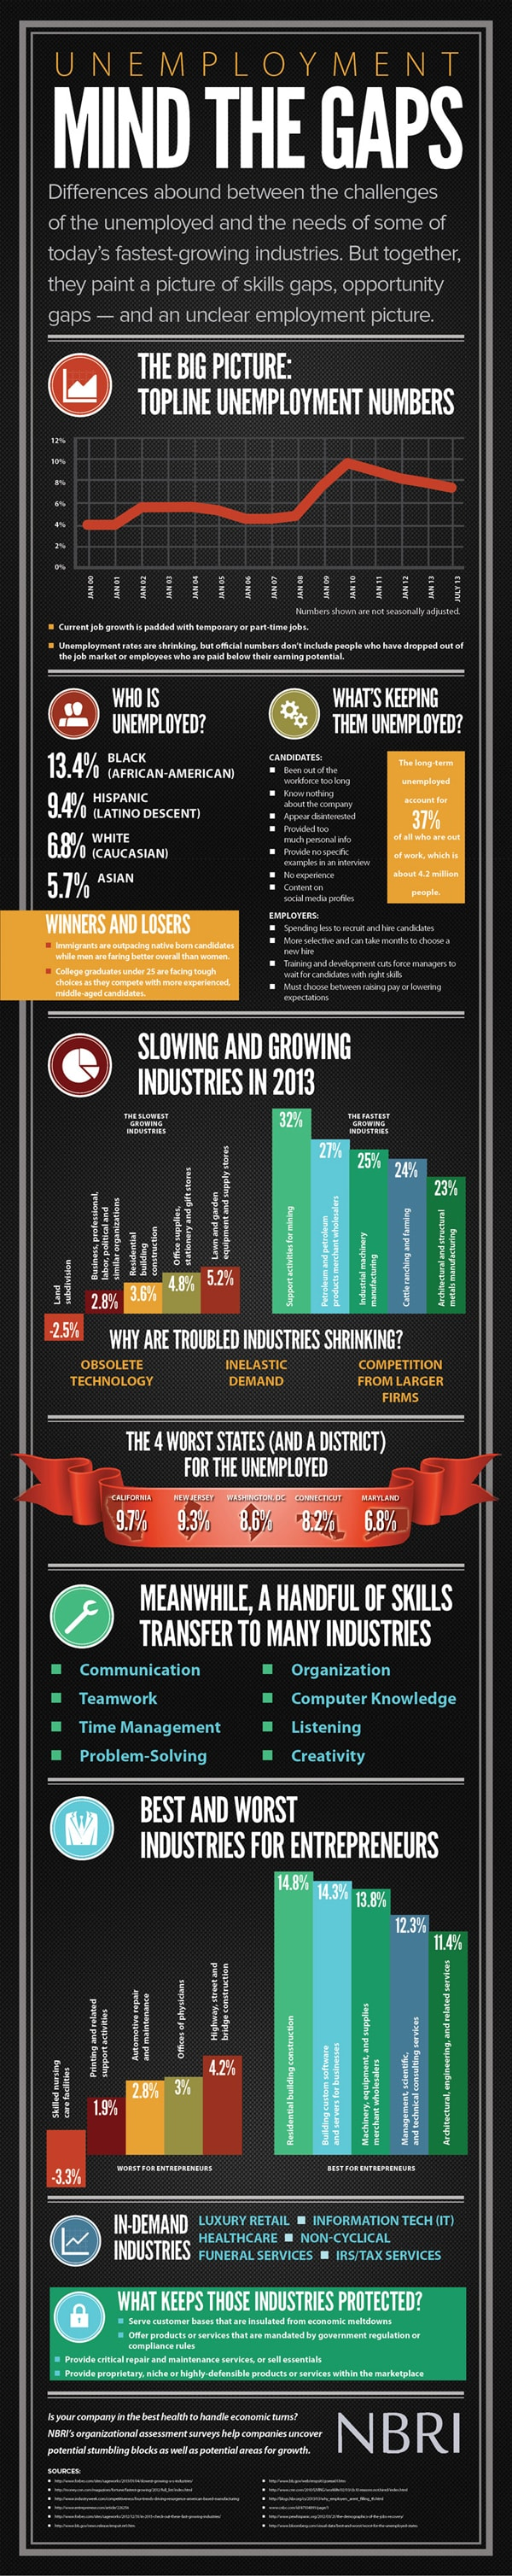 nbri-infographic-unemploymentmindthegaps